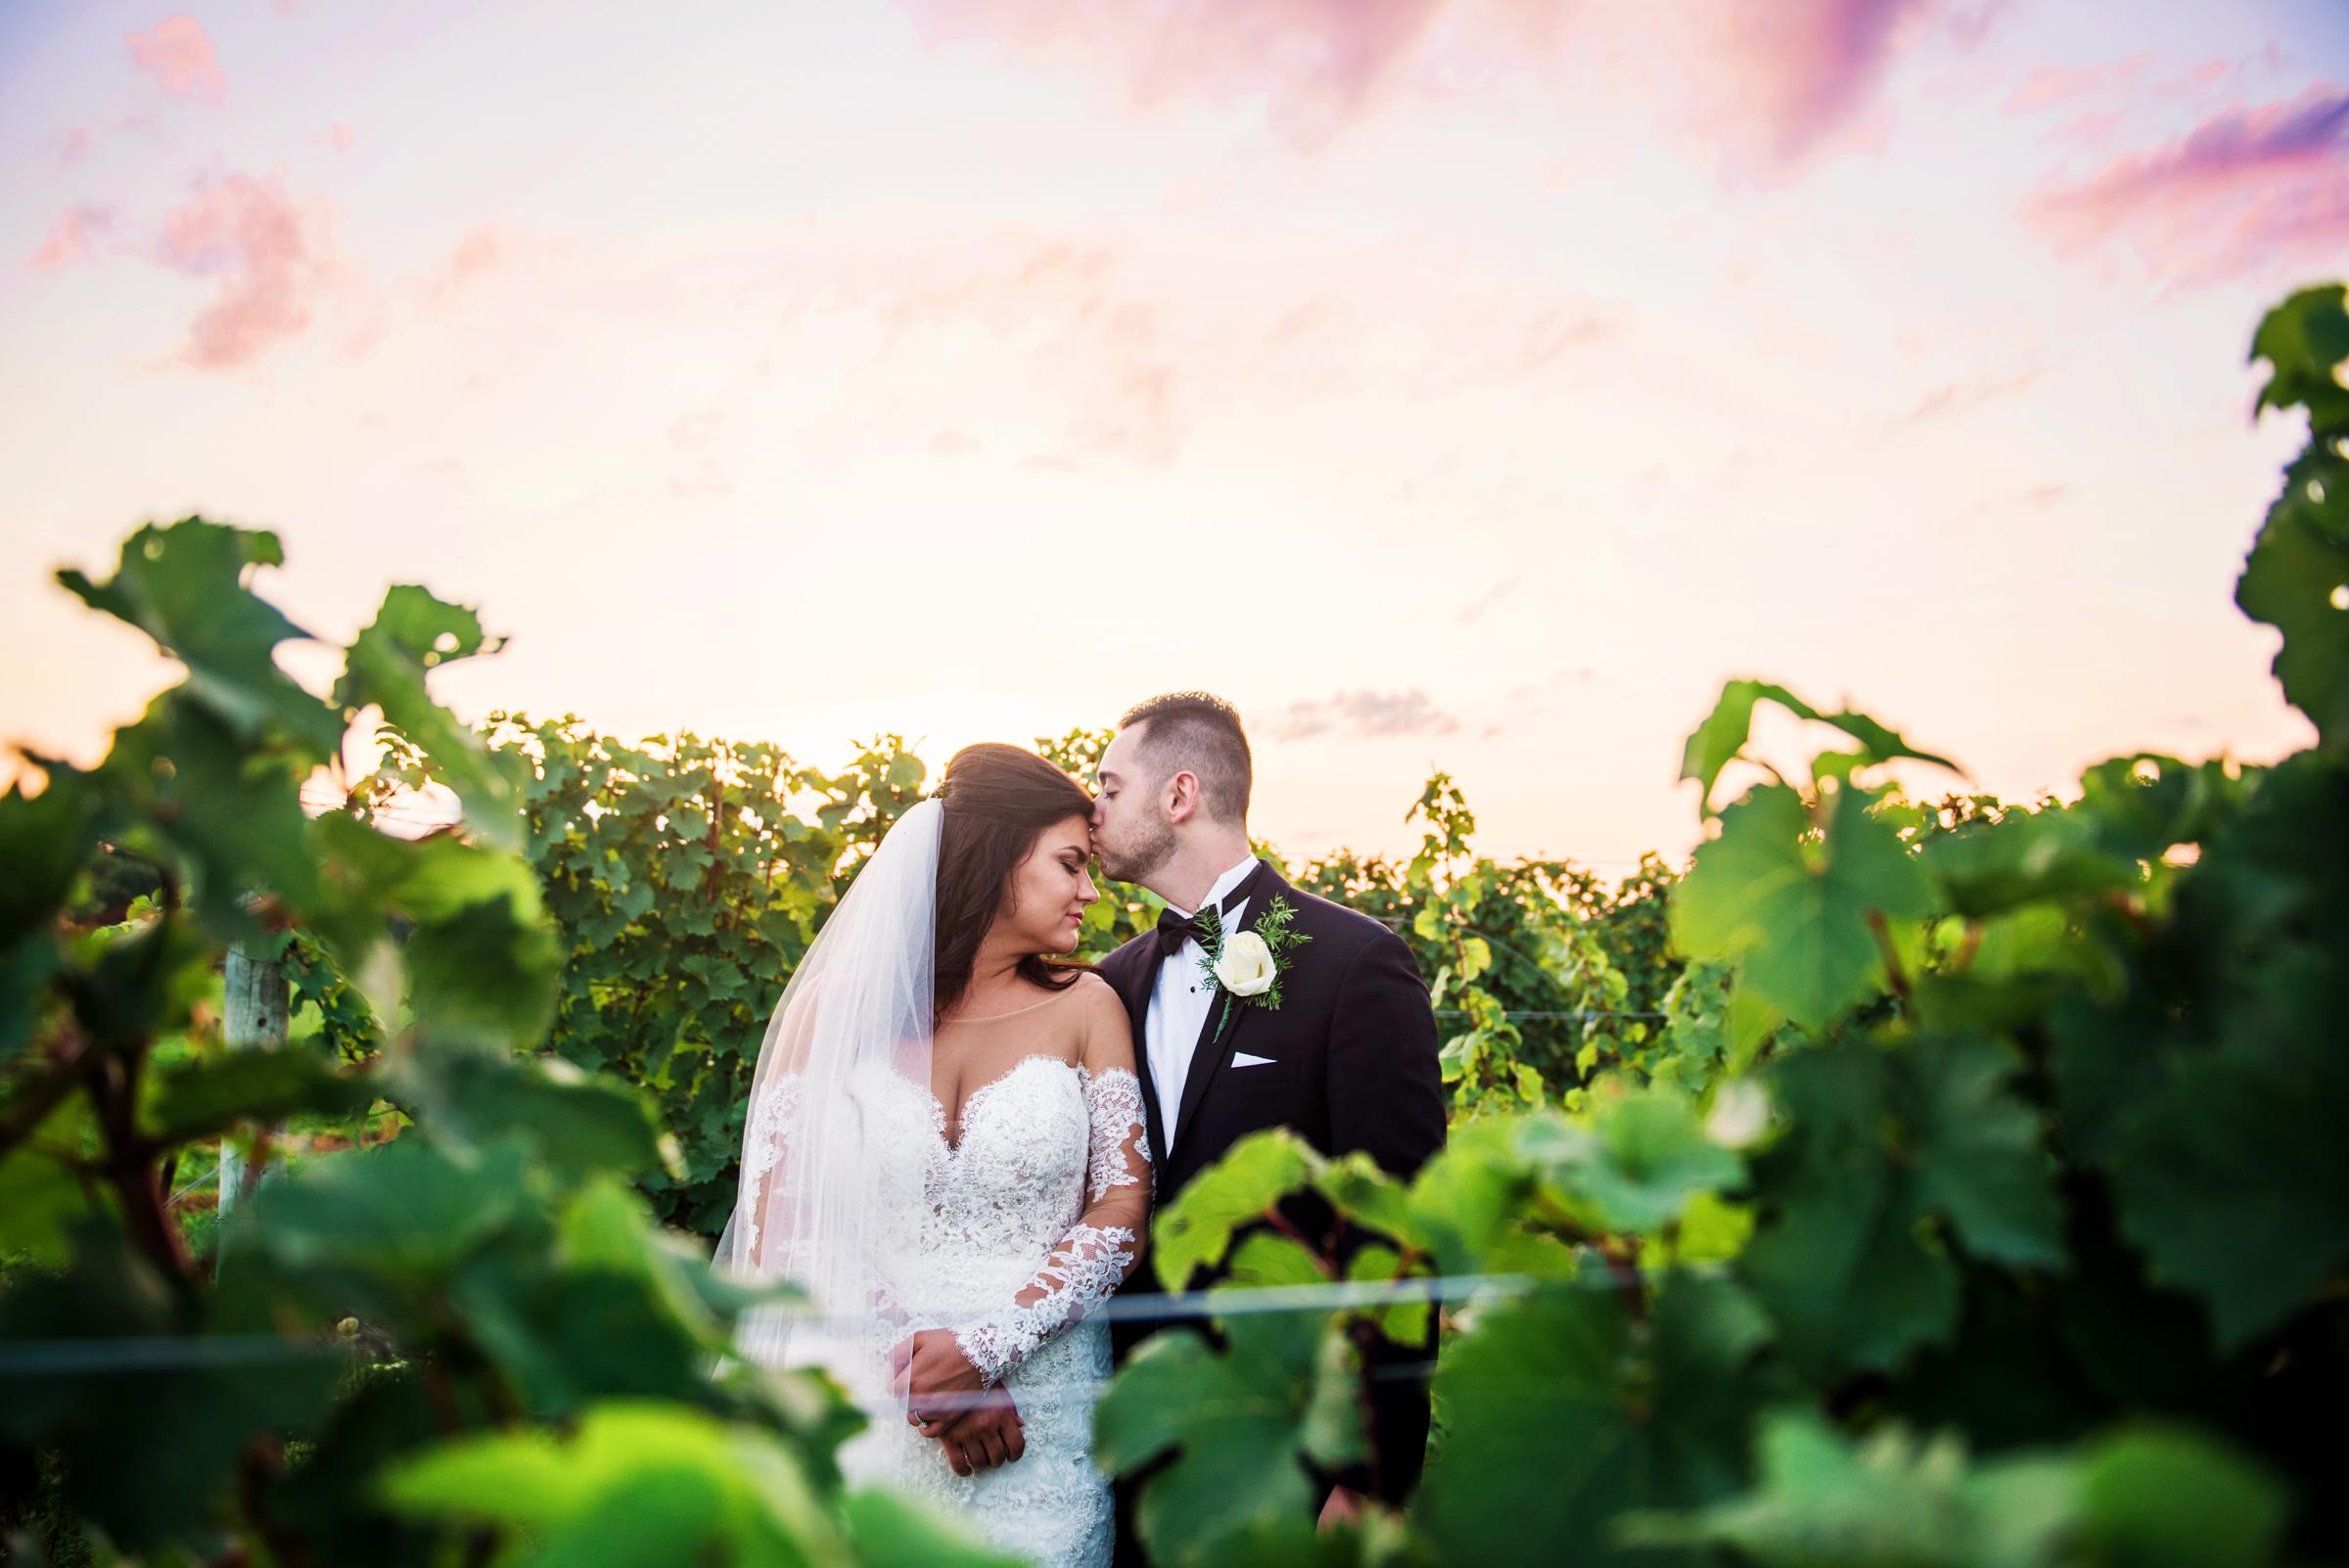 Casa_Larga_Rochester_Wedding_JILL_STUDIO_Rochester_NY_Photographer_DSC_3156.jpg